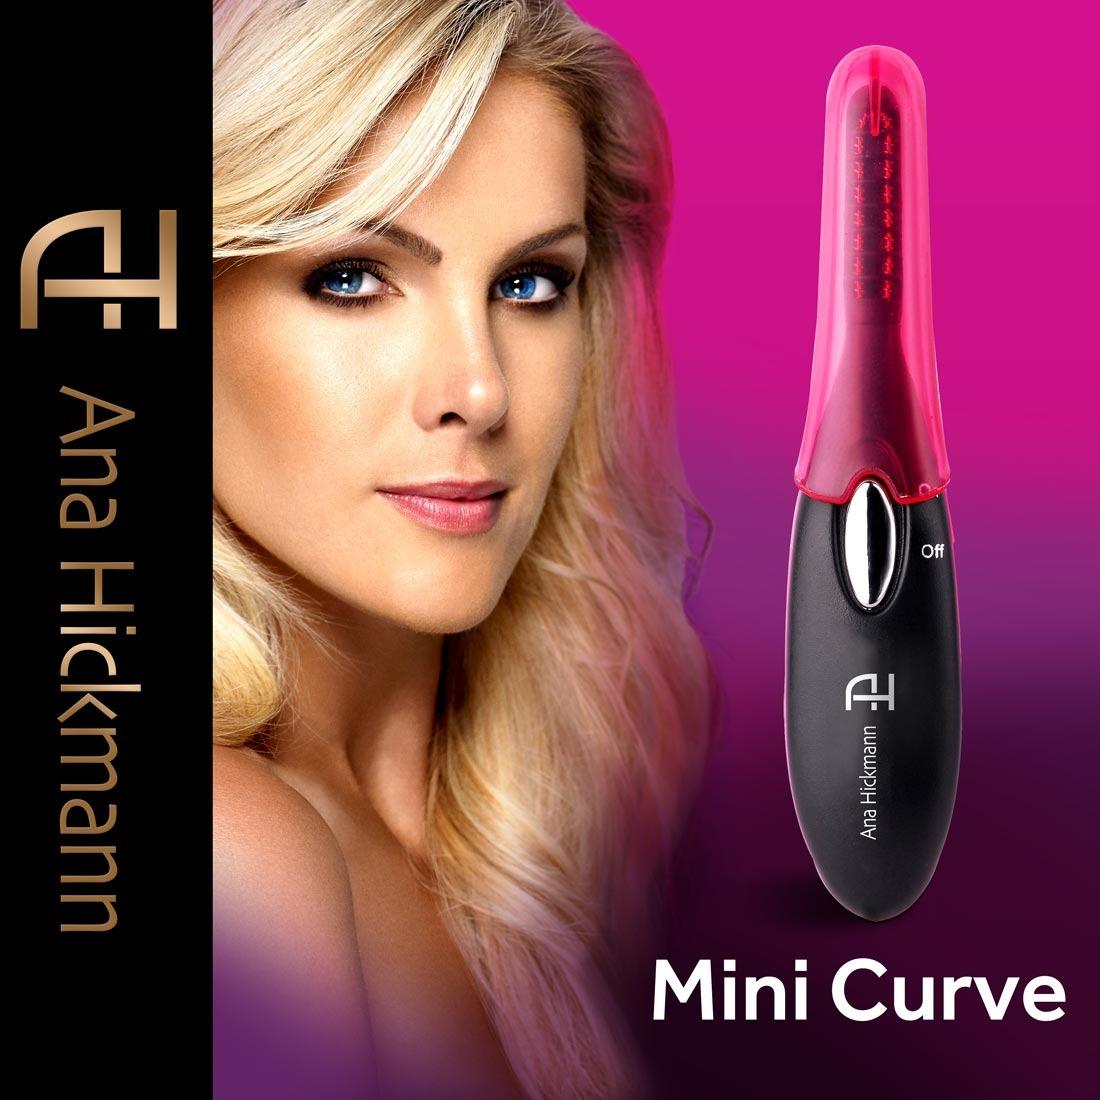 Modelador De Cílios Ana Hickmann Mini Curve Relaxbeauty